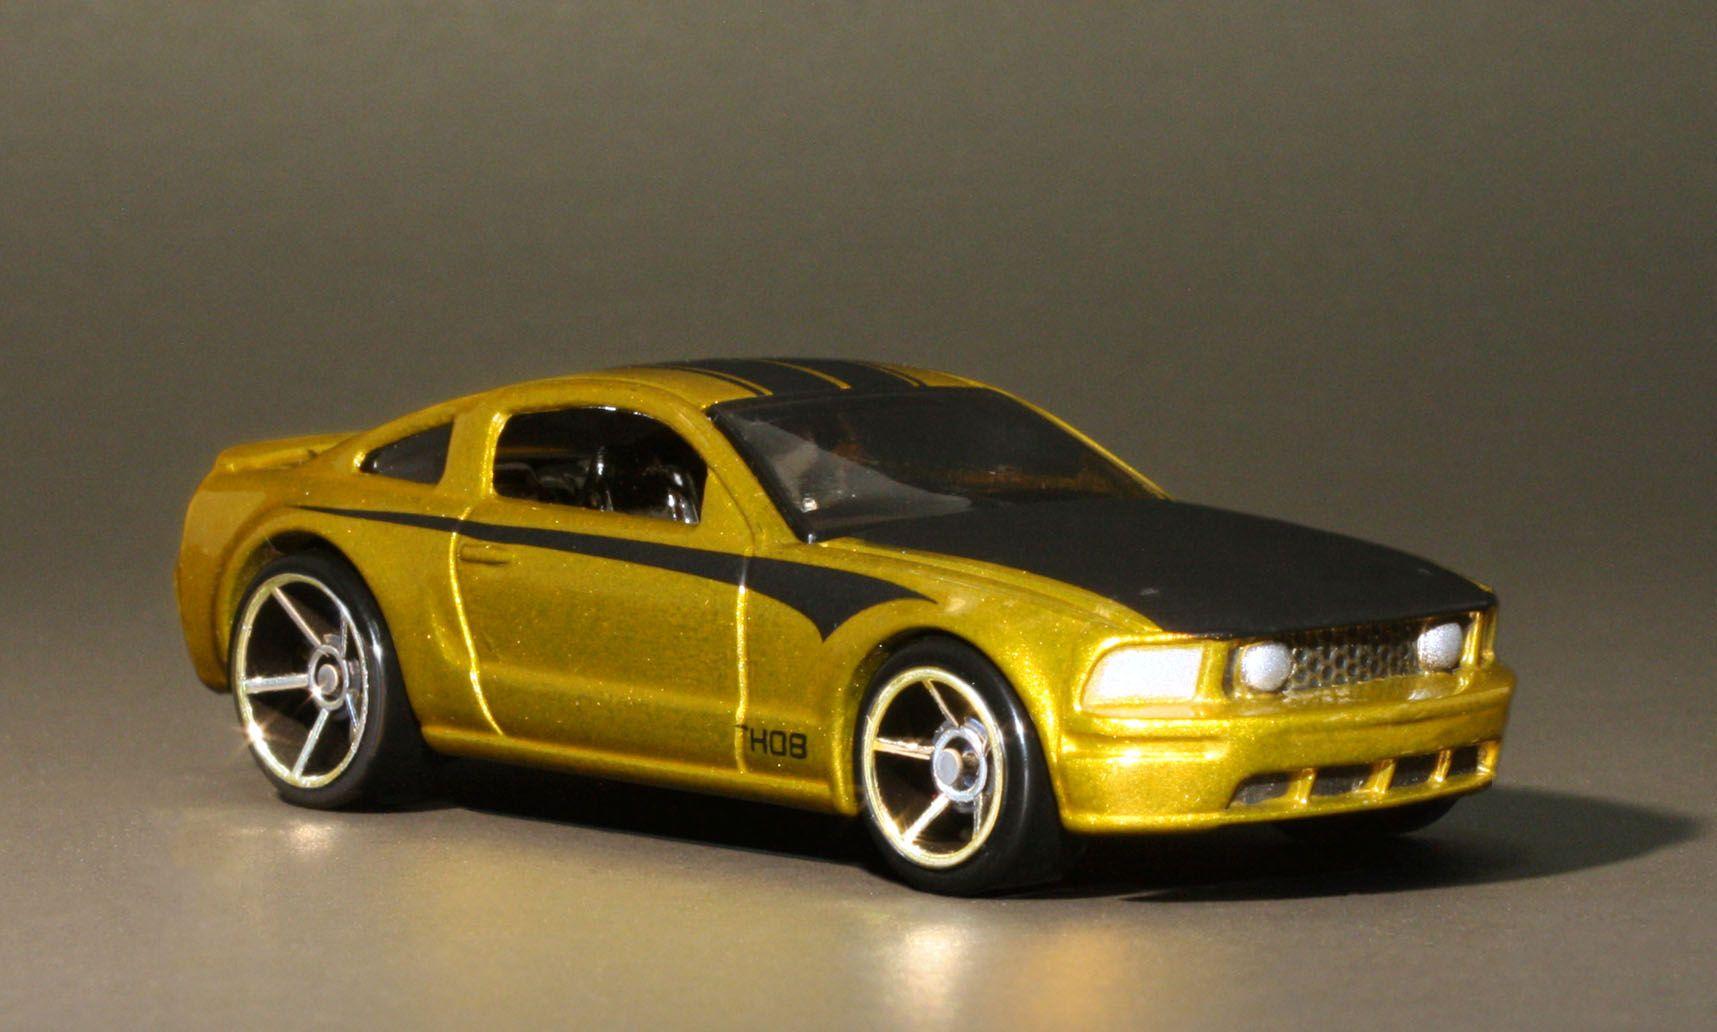 Hot wheels 2005 ford mustang gt treasure hunt